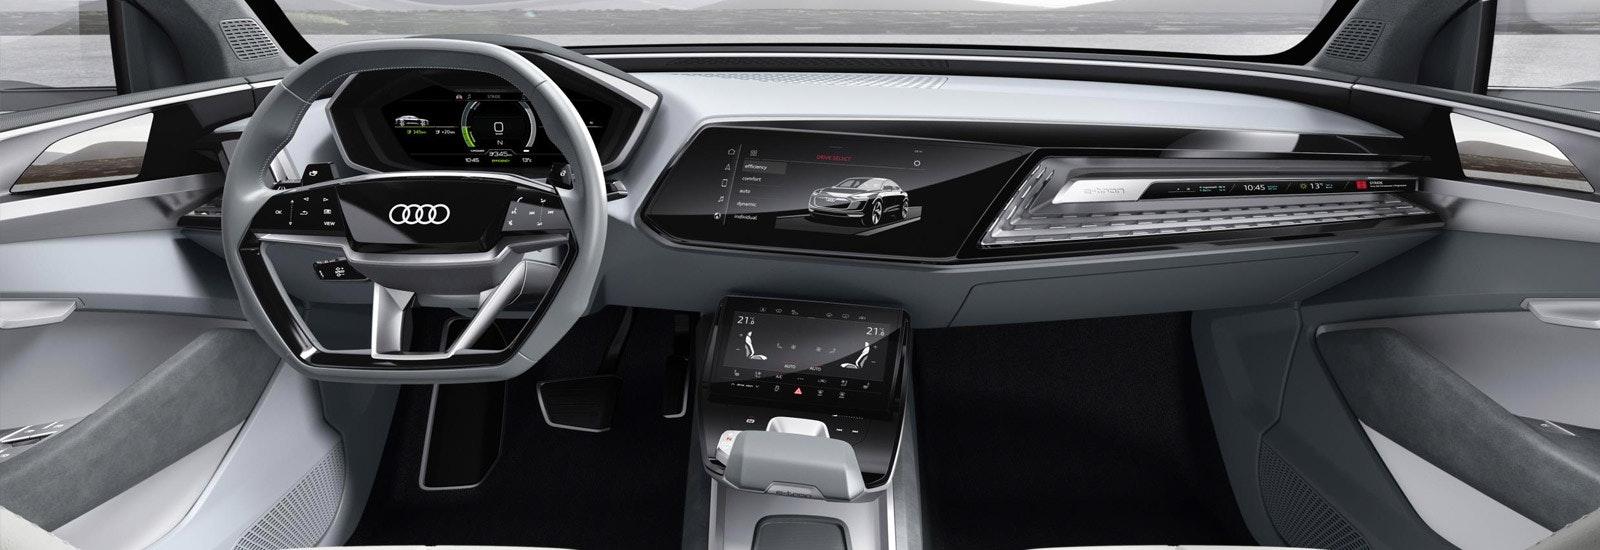 2019 Jaguar E Pace Changes Specs Price >> 2018 Jaguar I Pace Features Price Release Date Specs | Upcomingcarshq.com